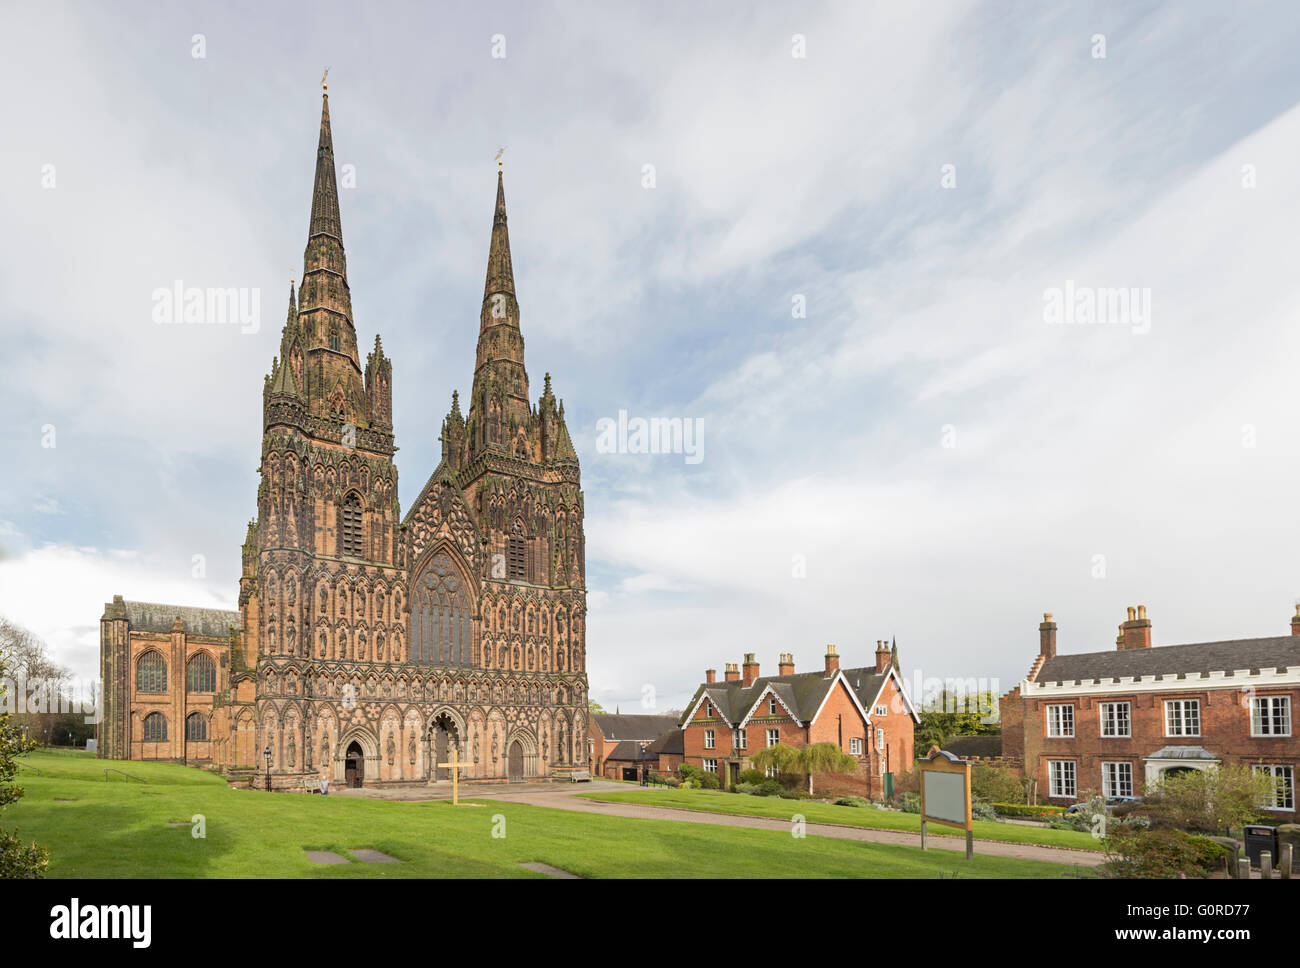 Lichfield Cathedral, Lichfield, Staffordshire, England, UK - Stock Image